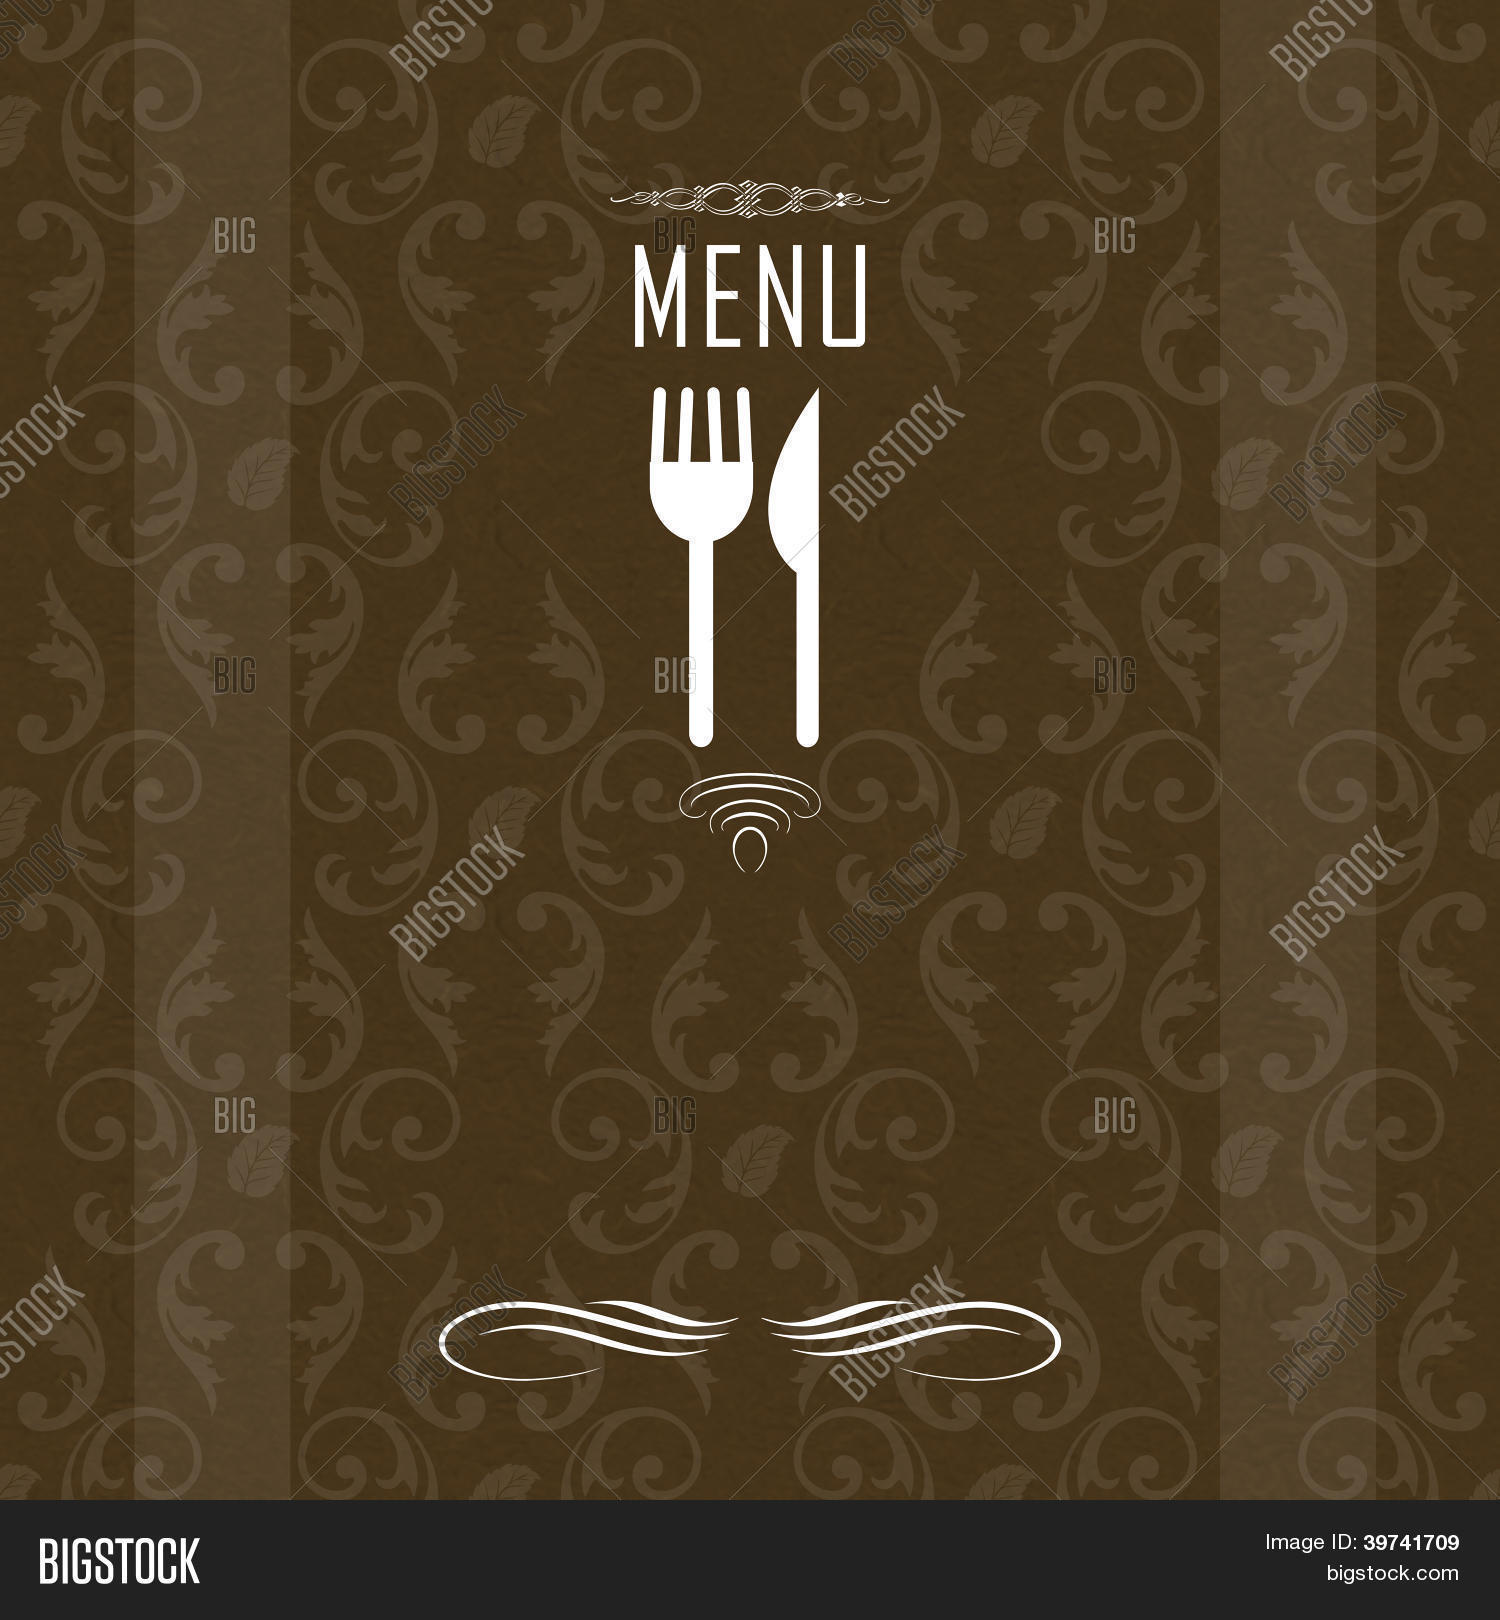 Elegant Restaurant Image Photo Free Trial Bigstock